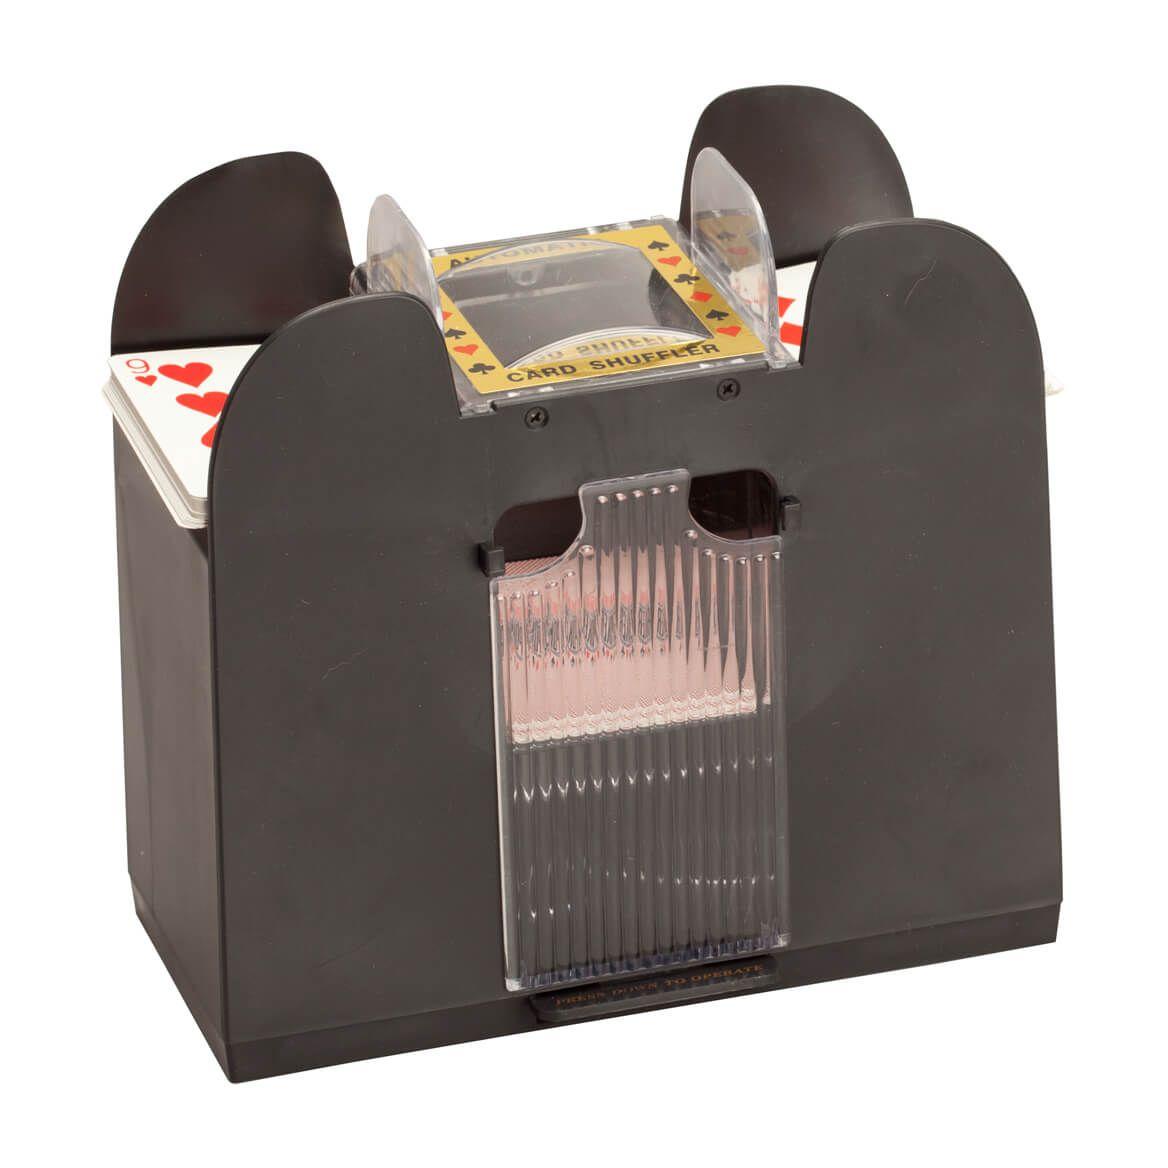 Automatic Card Shuffler 6 Deck-361271